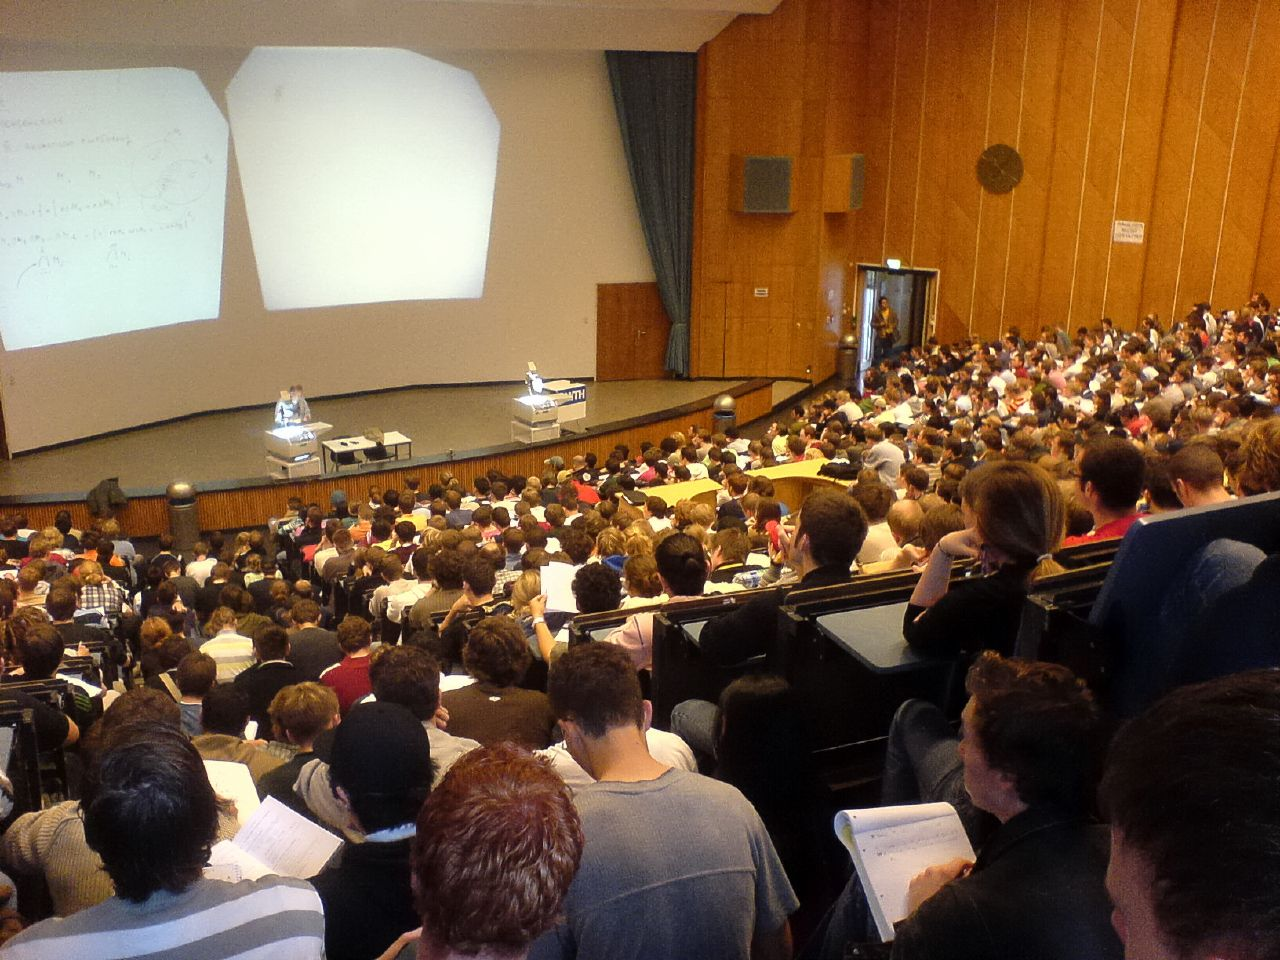 Crowded math course. (Thomas W/Flickr)